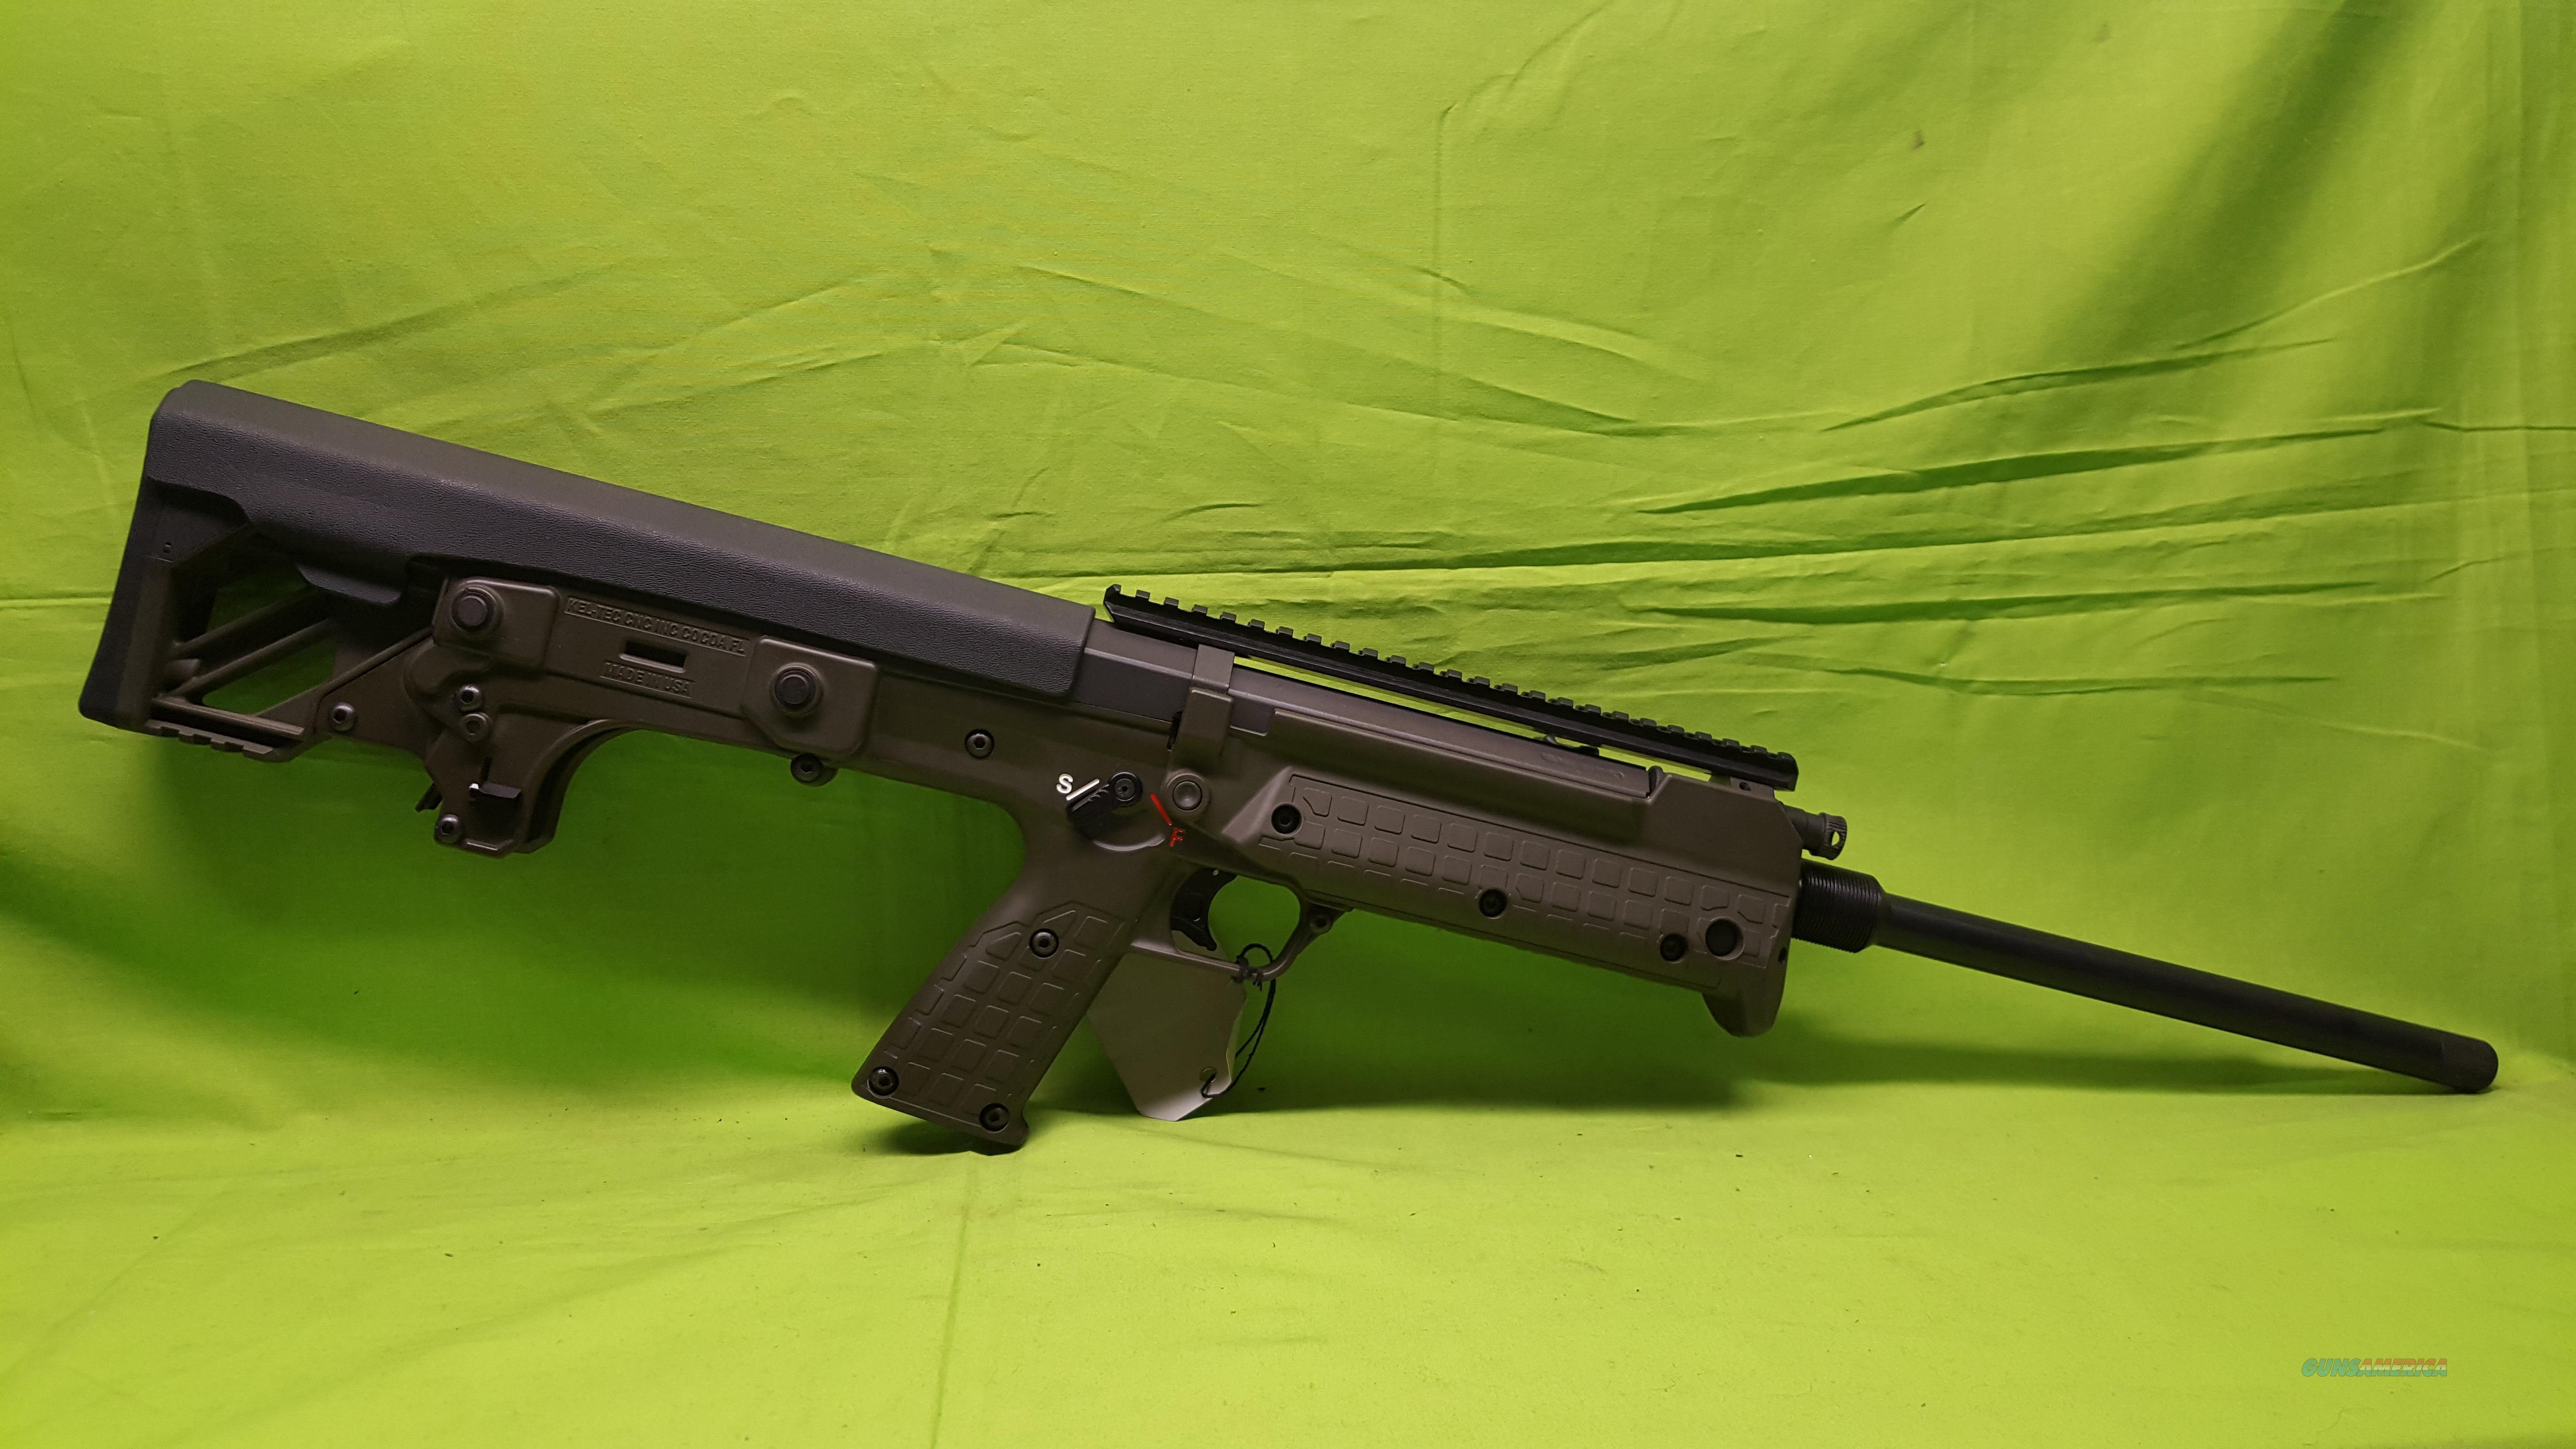 "KELTEC KEL TEC RFB 7.62 308 24"" ODG 20RD HUNTER  Guns > Rifles > Kel-Tec Rifles"